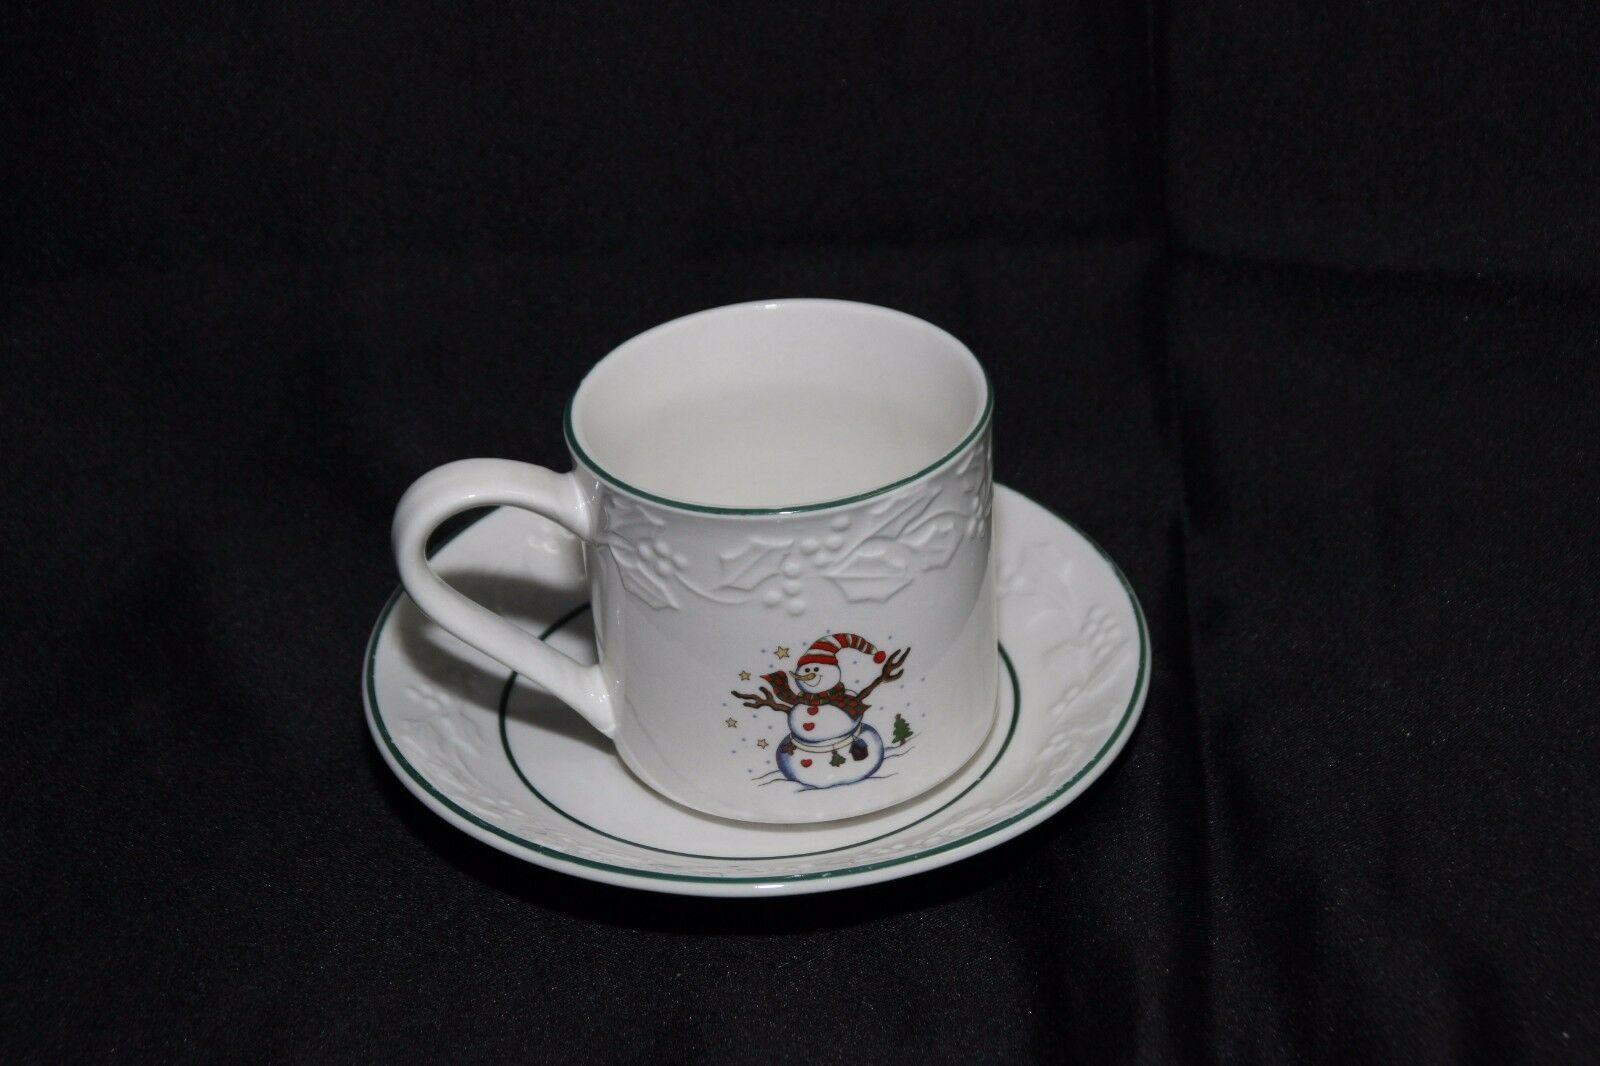 GEI Snowman Xmas 4 Cups 2 Saucers image 2